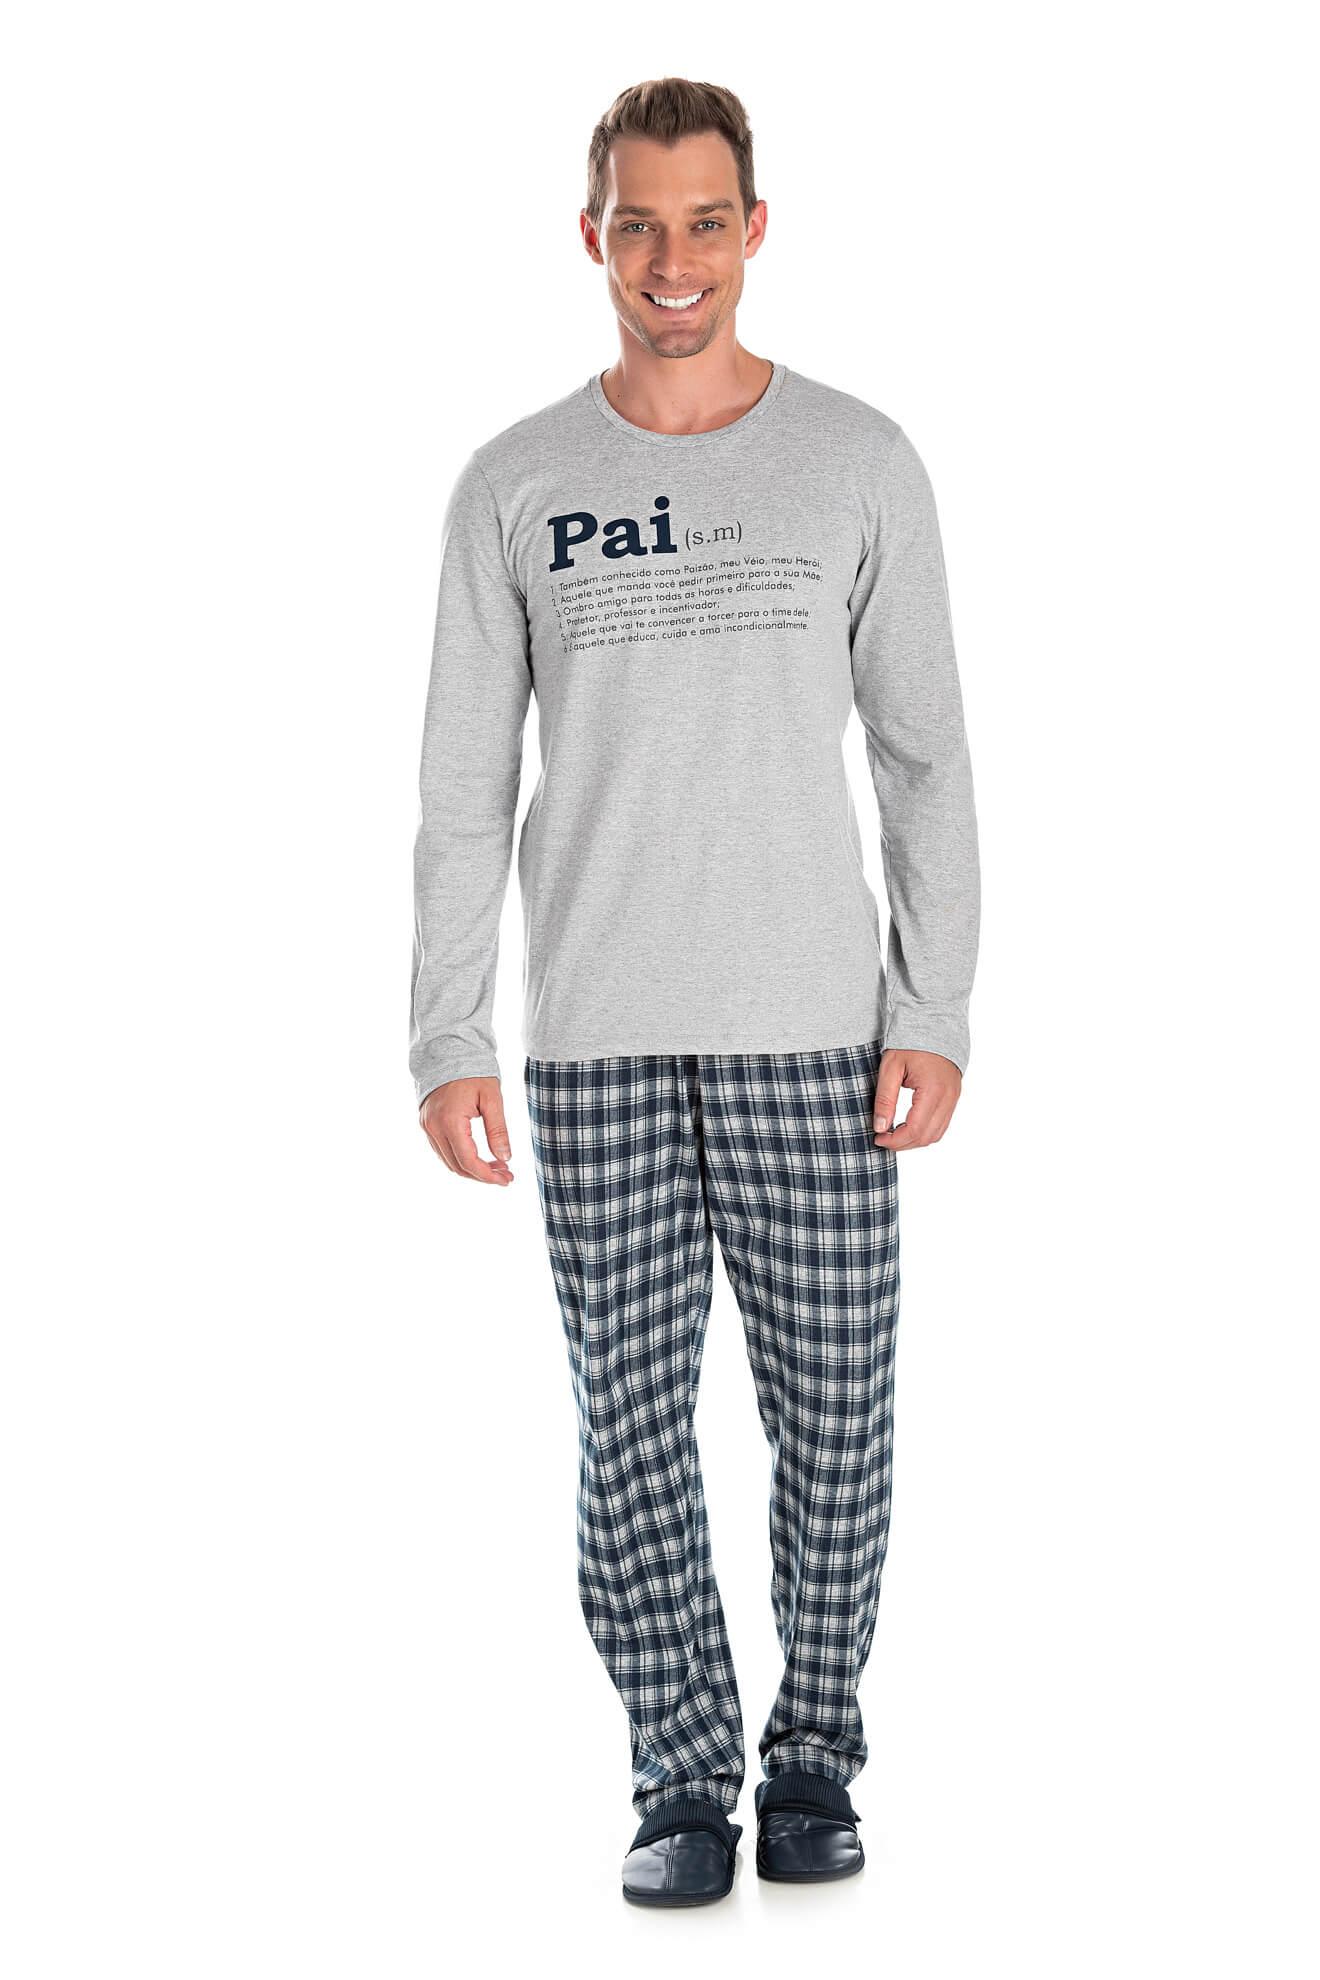 004/A - Pijama Adulto Masculino Xadrez Família Completa